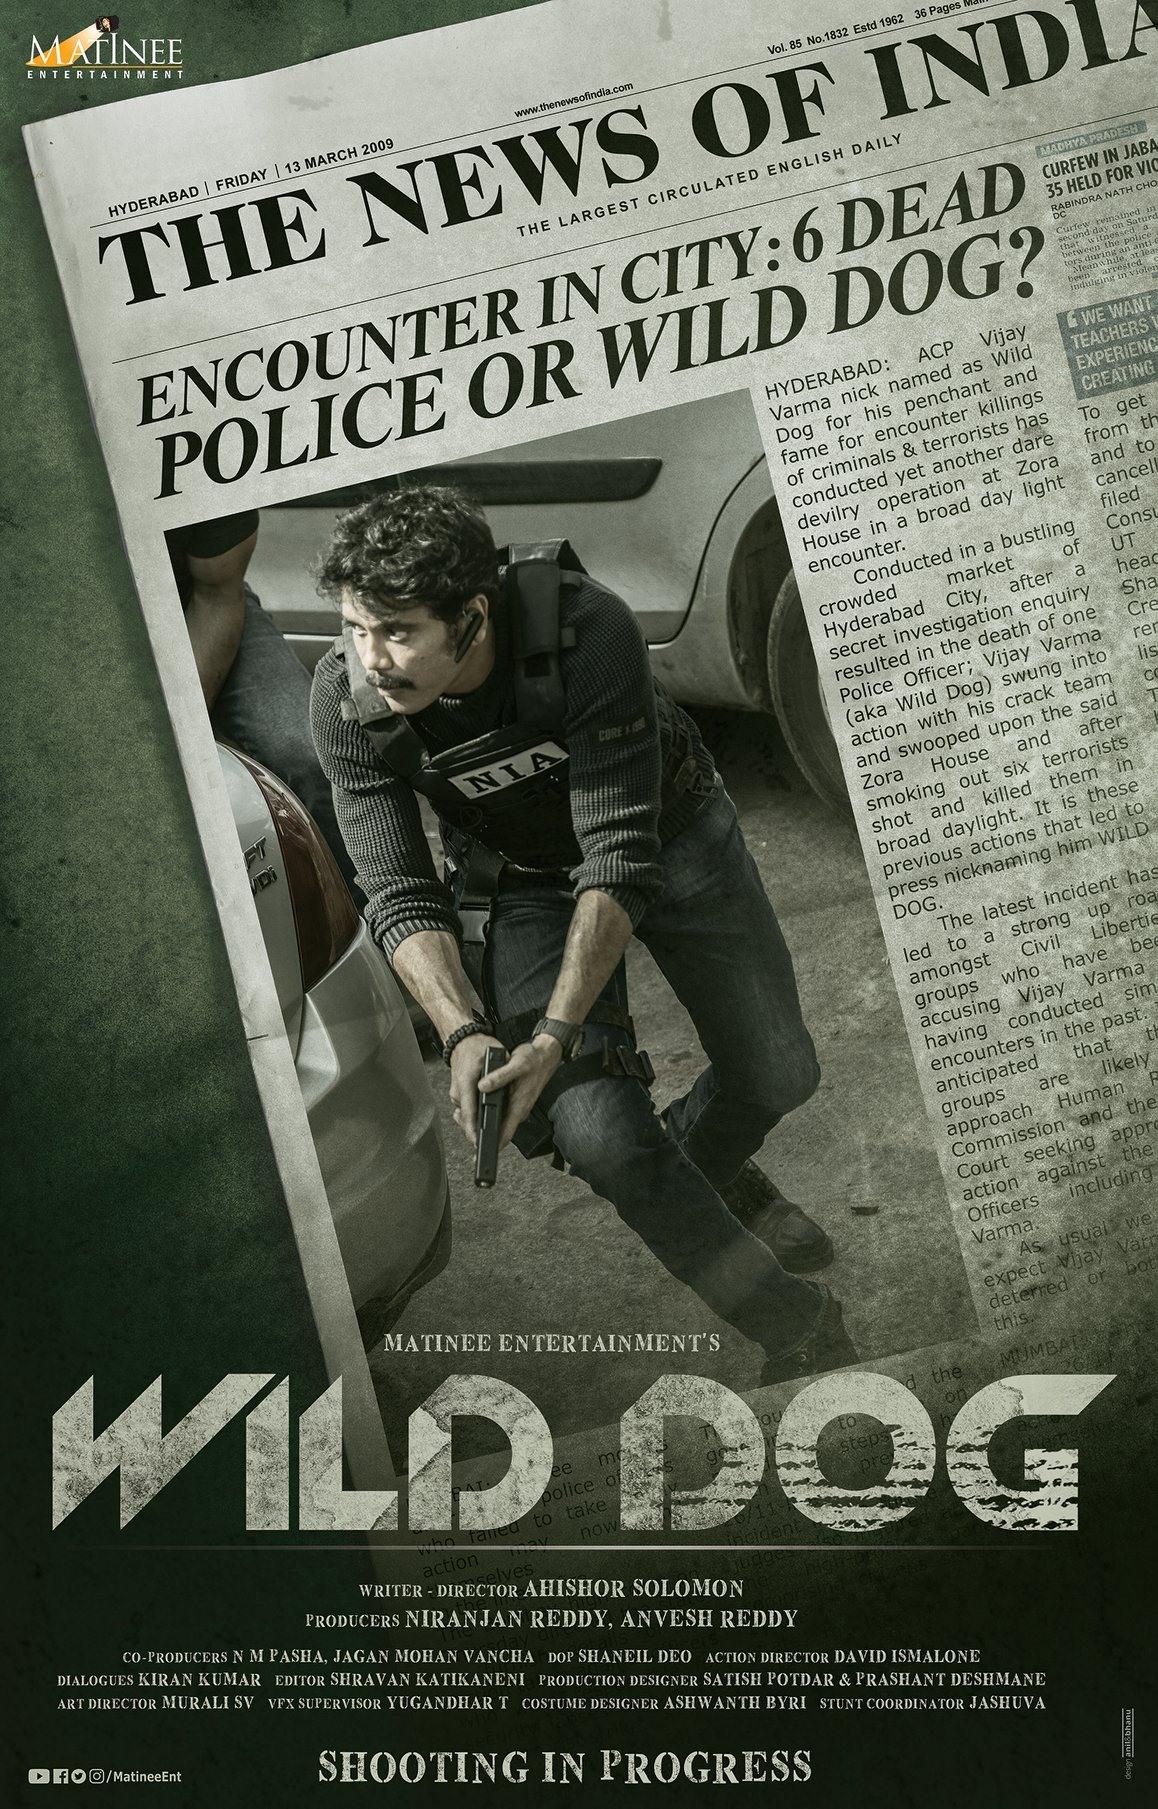 DARE DEVIL Encounter Specialist ACP Vijay Varma AKA Wild Dog Movie First Look Poster HD